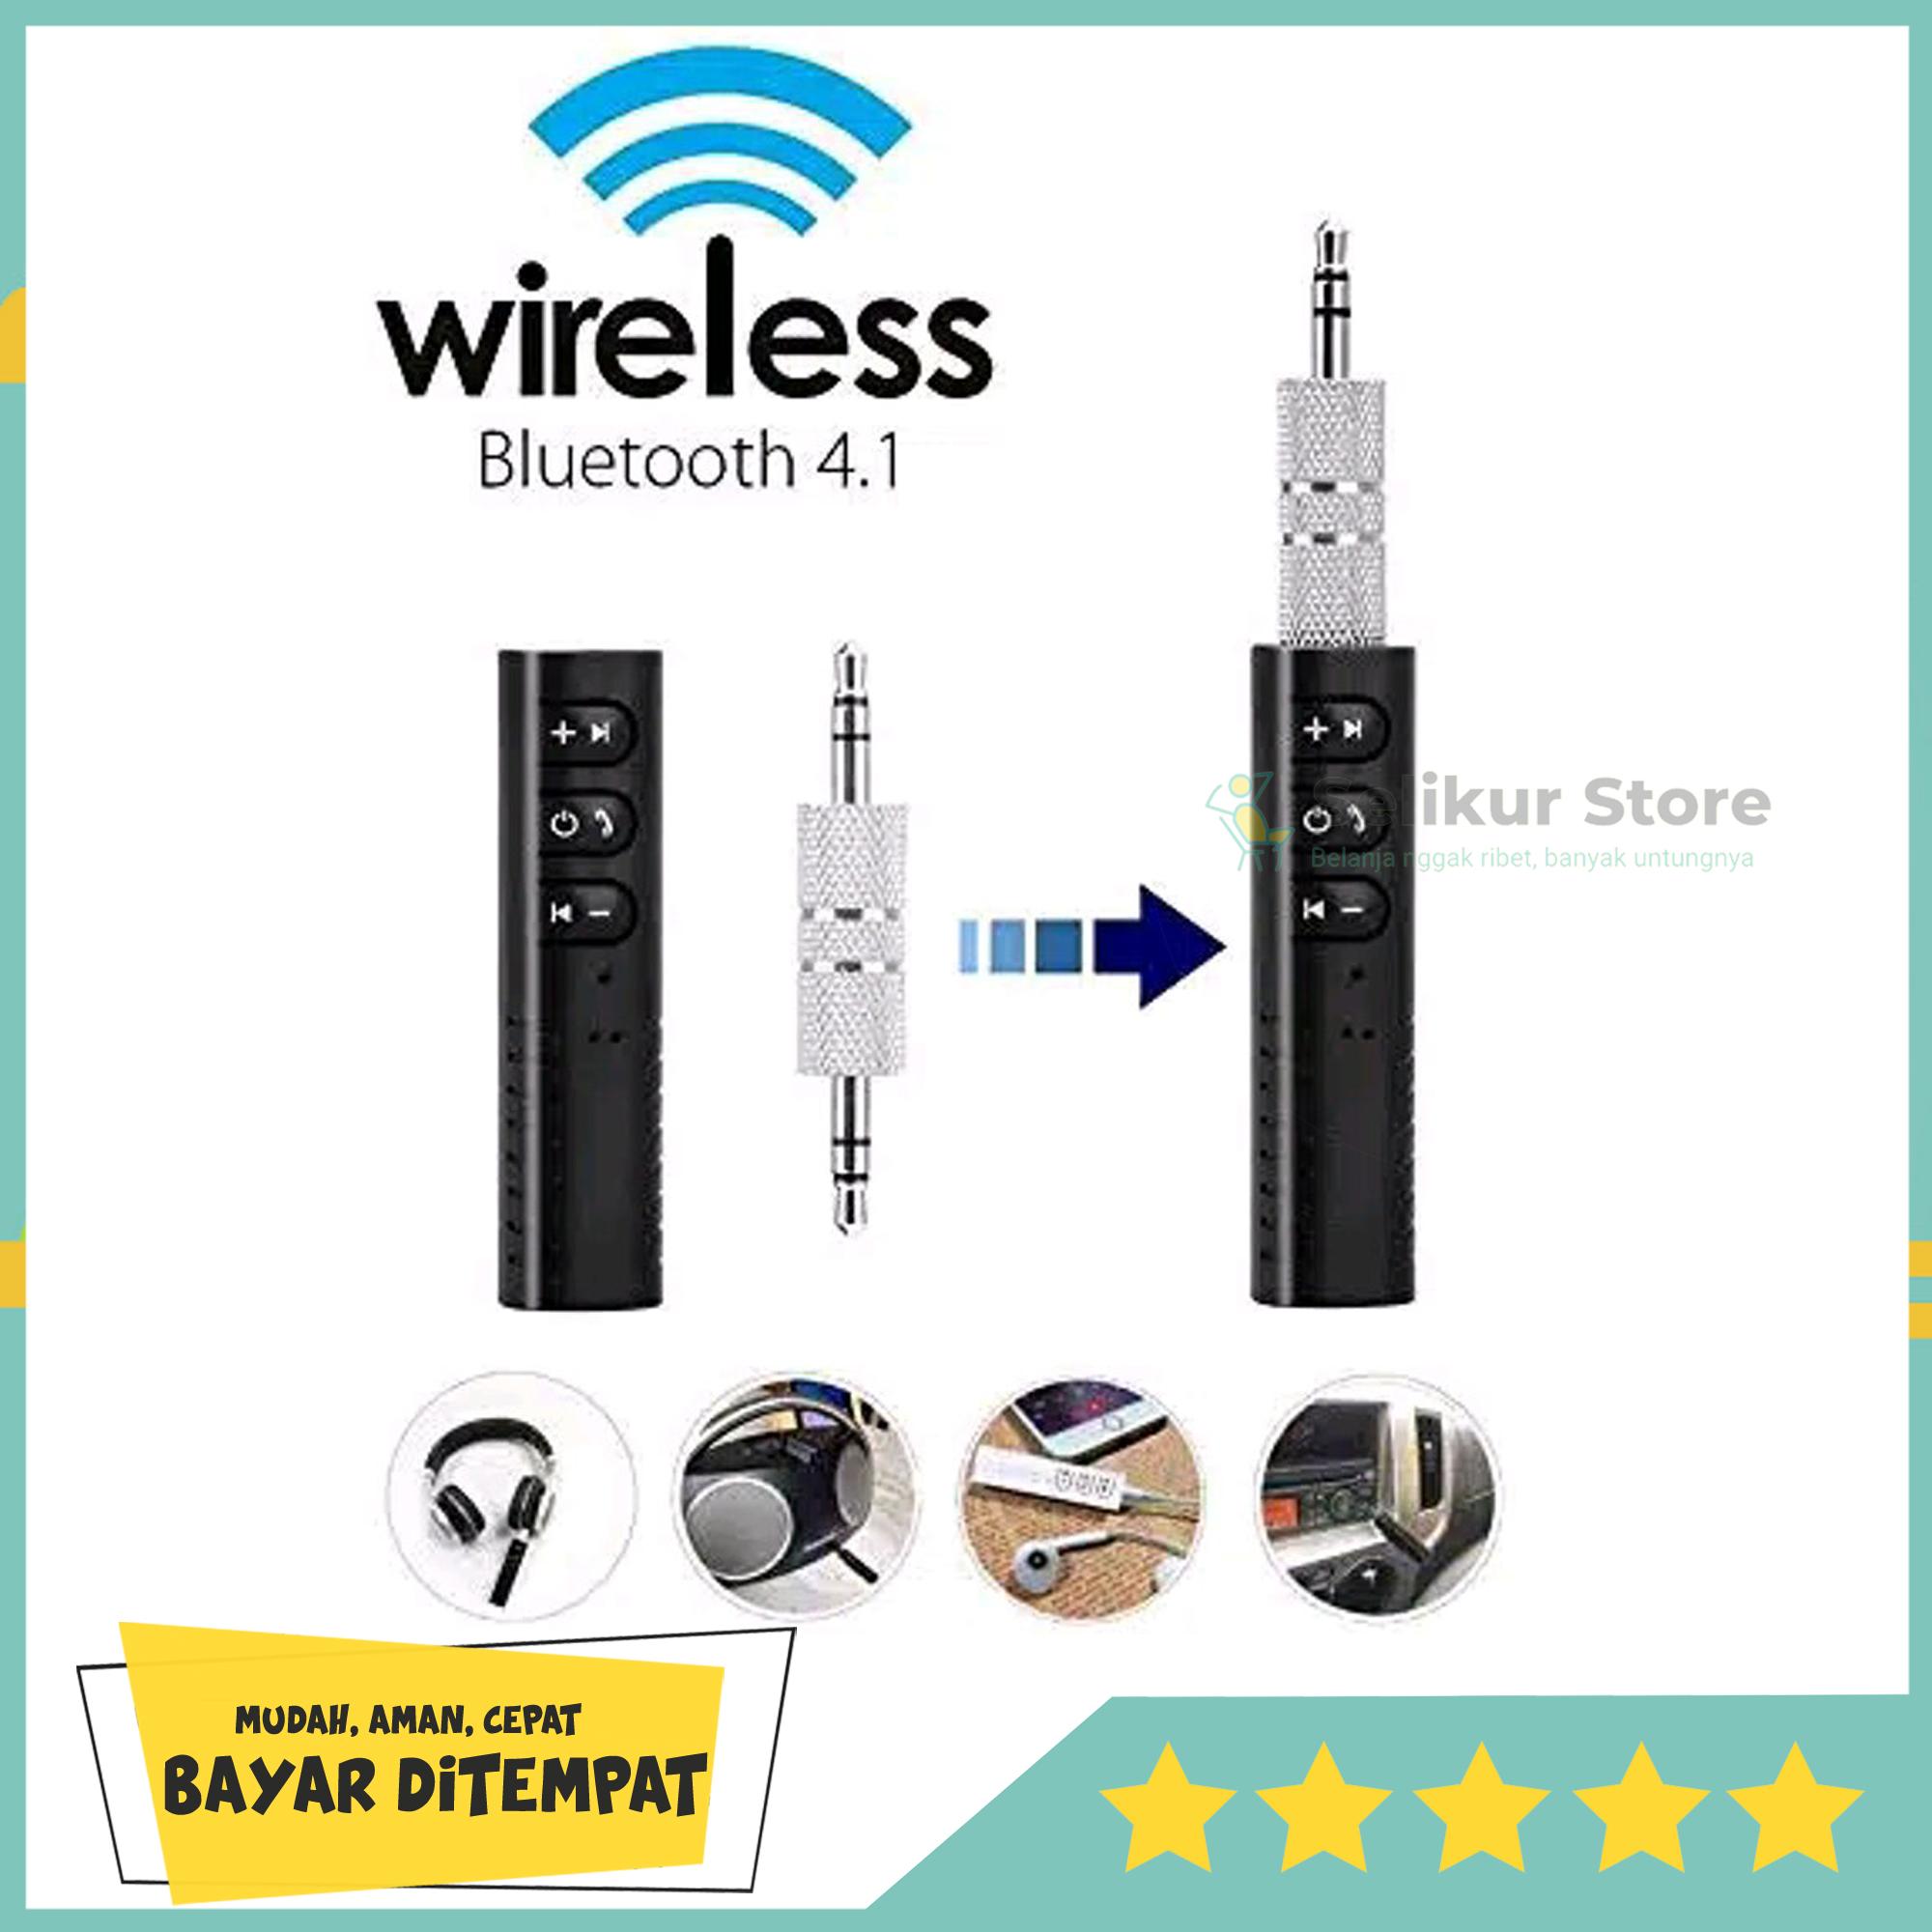 new 2020 bluetooth wireless audio receiver audio jack music bt 301 generasi  atau alat bluetooth speaker | alat bluetooth untuk speaker | blutut audio receiver | blutut audio speaker